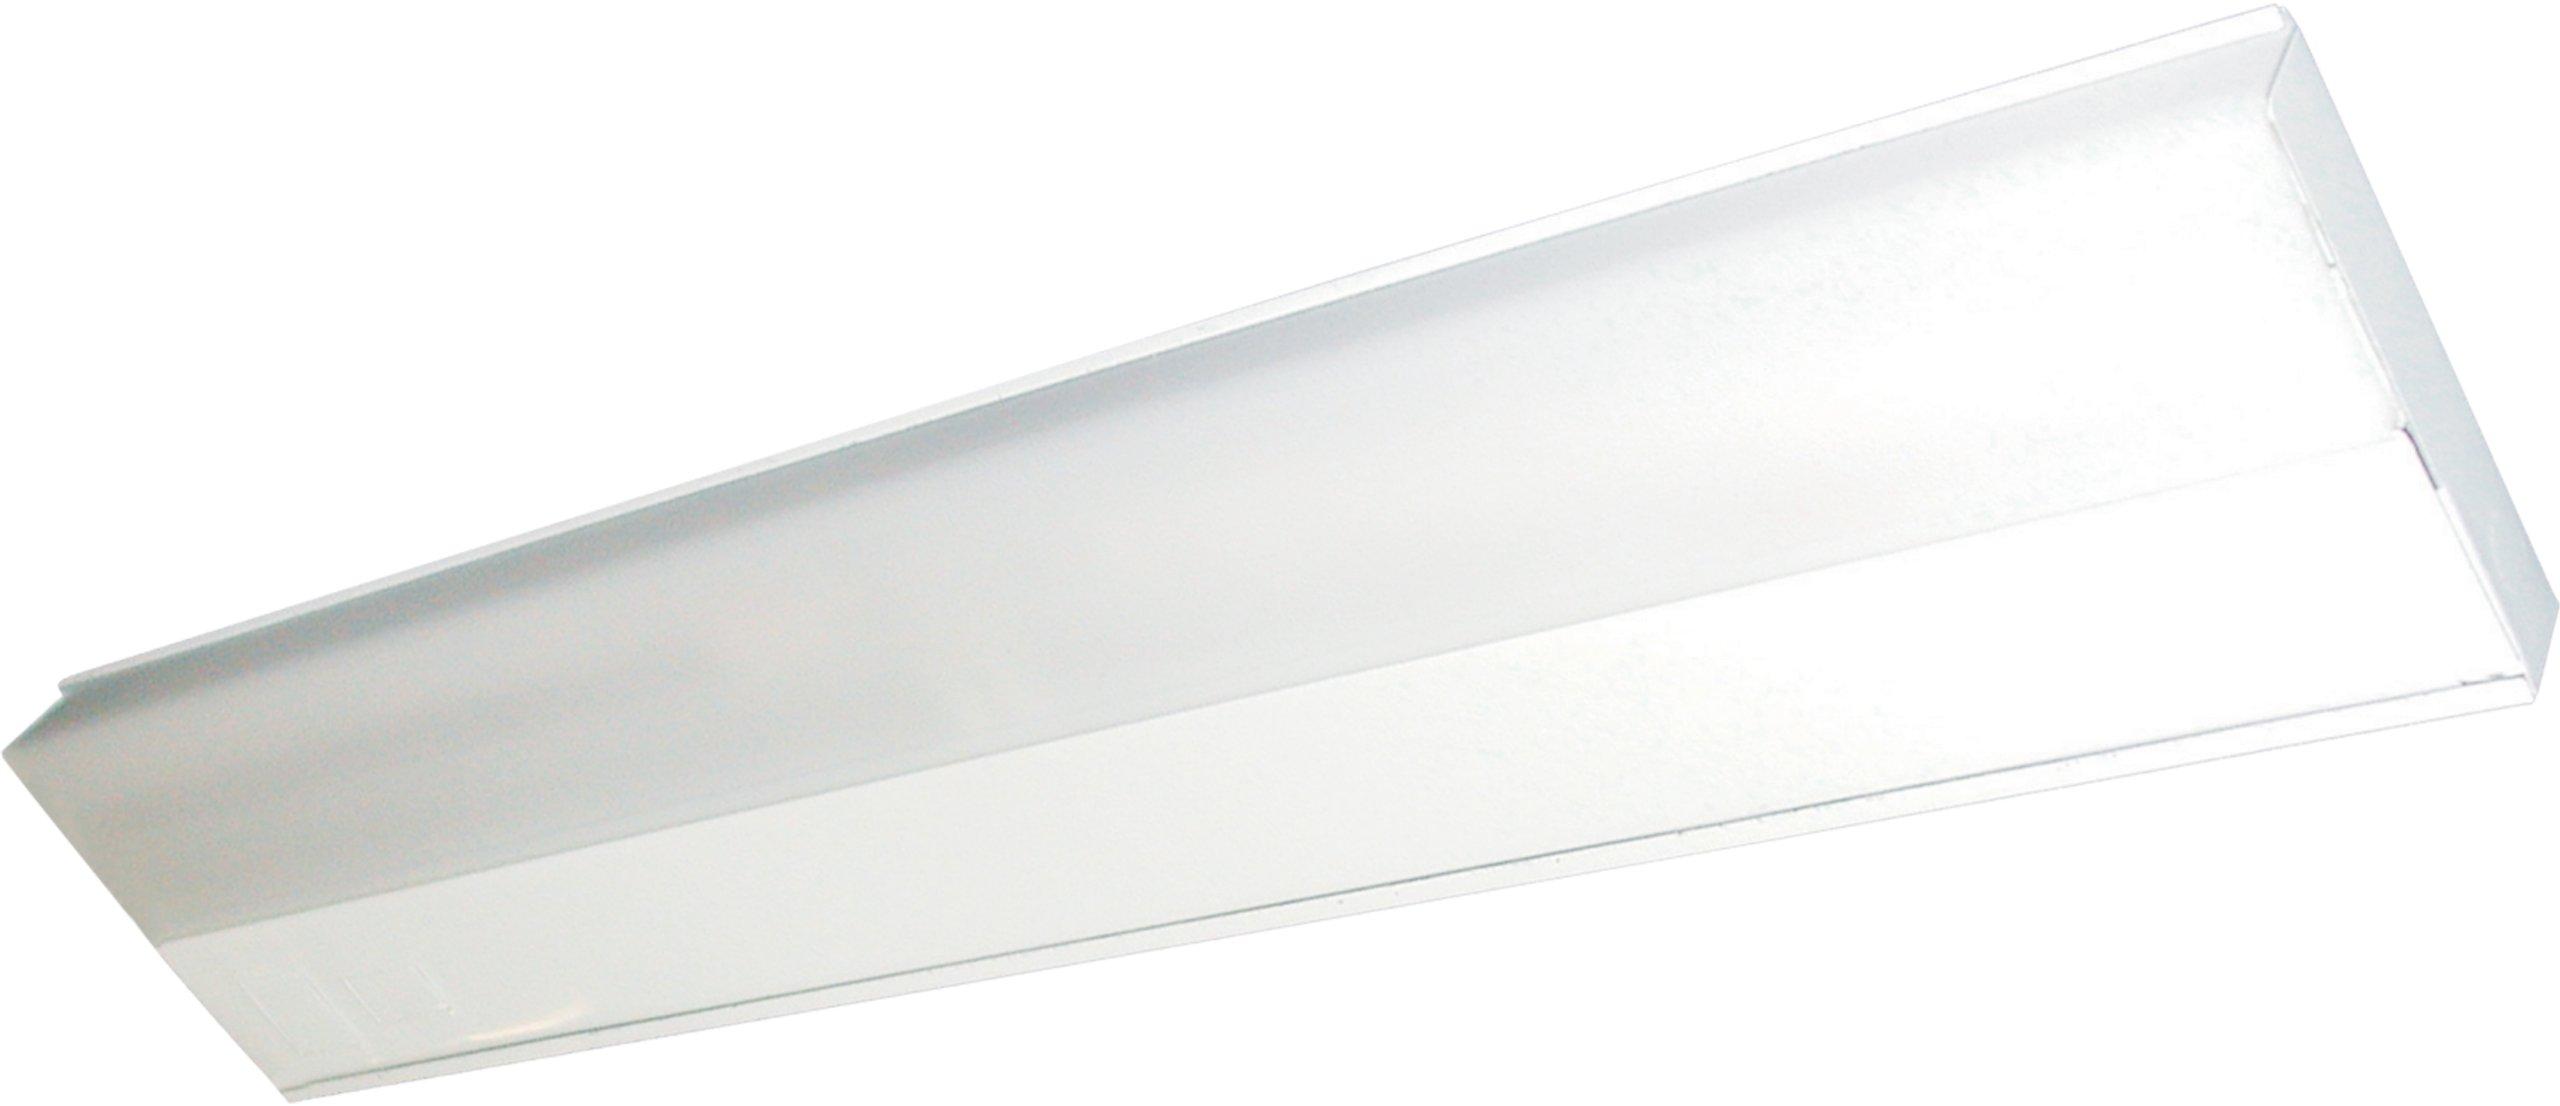 Maxim 87807WT CounterMax MX-FD 24'' 1-Light Fluorescent, White Finish, White Glass, Mini Bi Pin T5 Fluorescent Fluorescent Bulb , 18W Max., Wet Safety Rating, 2700K Color Temp, Shade Material, 1355 Rated Lumens